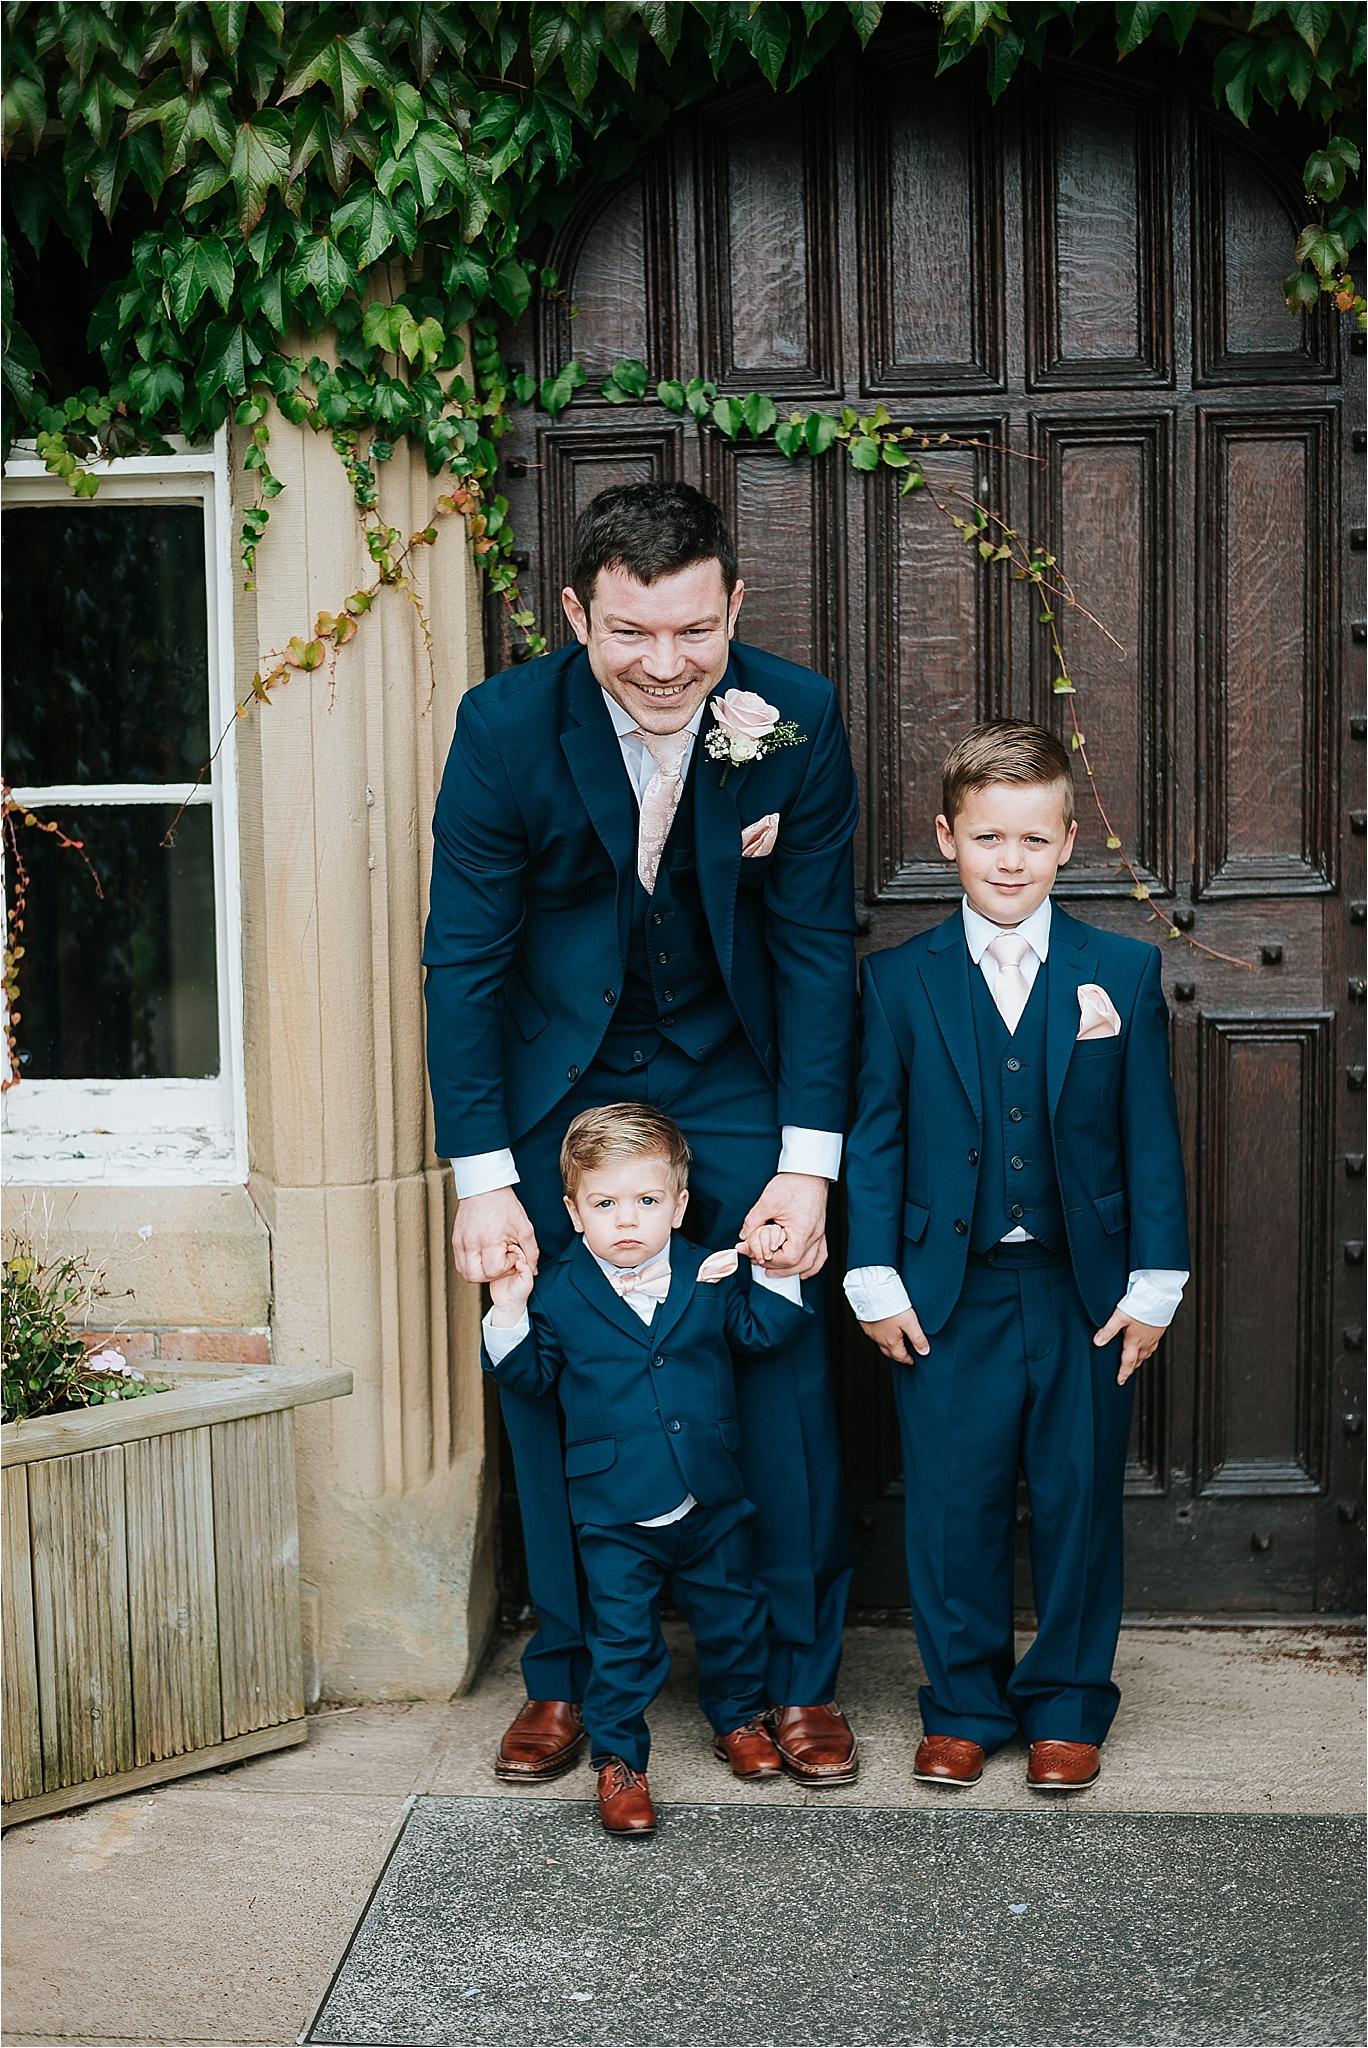 thevilla+lancashire+wreagreen+wedding+photographer19.jpg